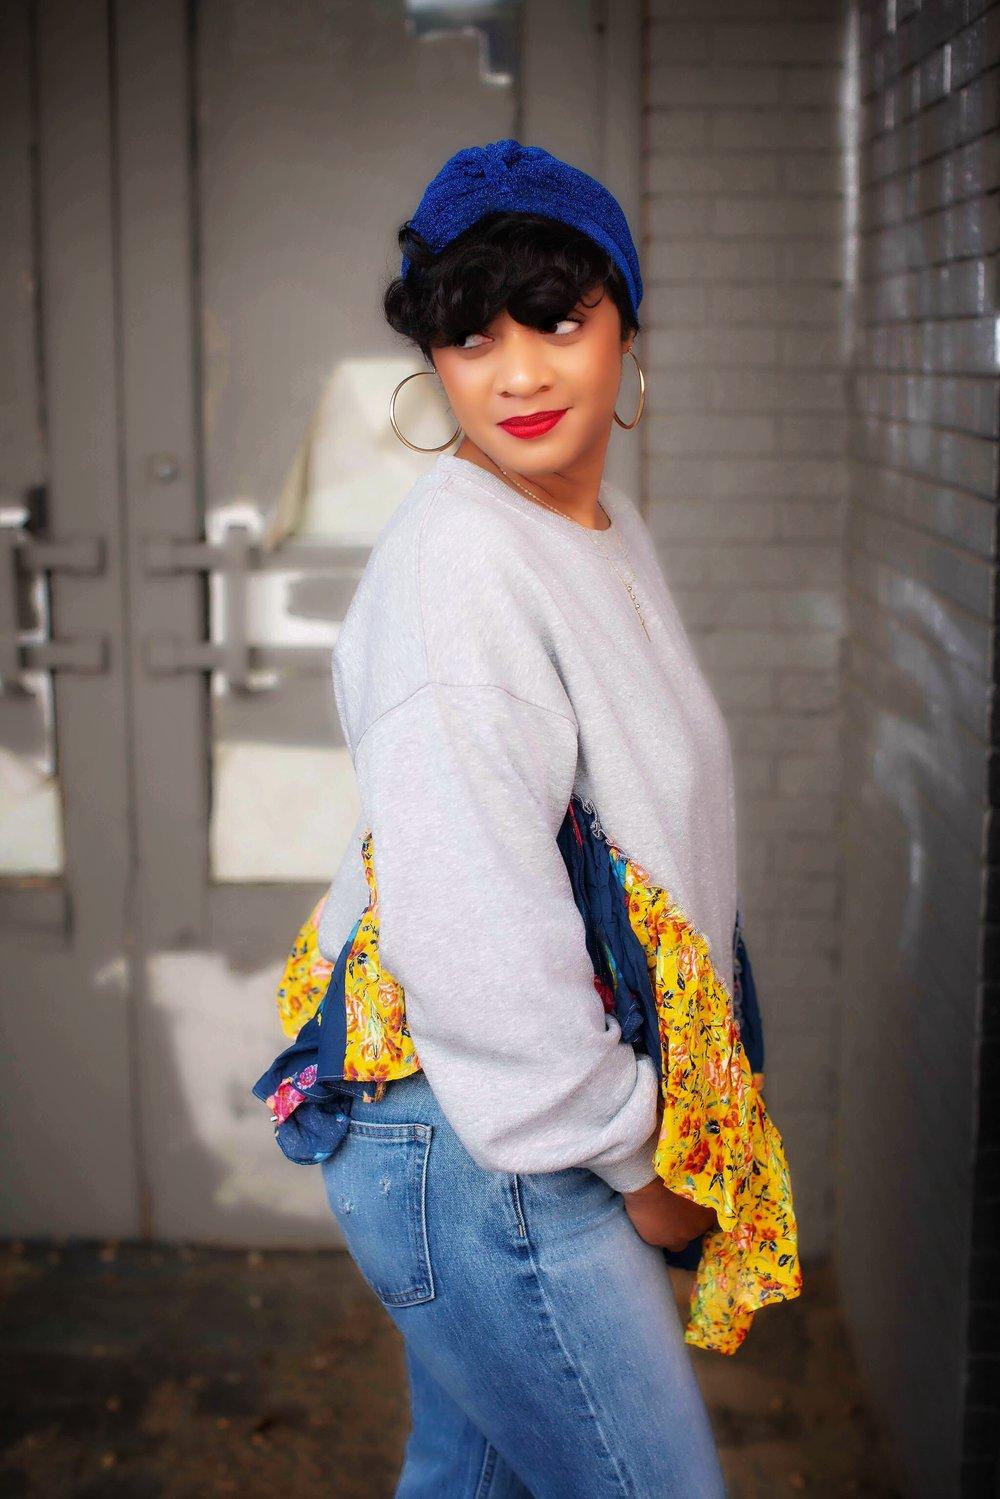 Free People - She's So Cute Sweatshirt    ,    Gap Cone Denim High Rise Crop Straight Jeans